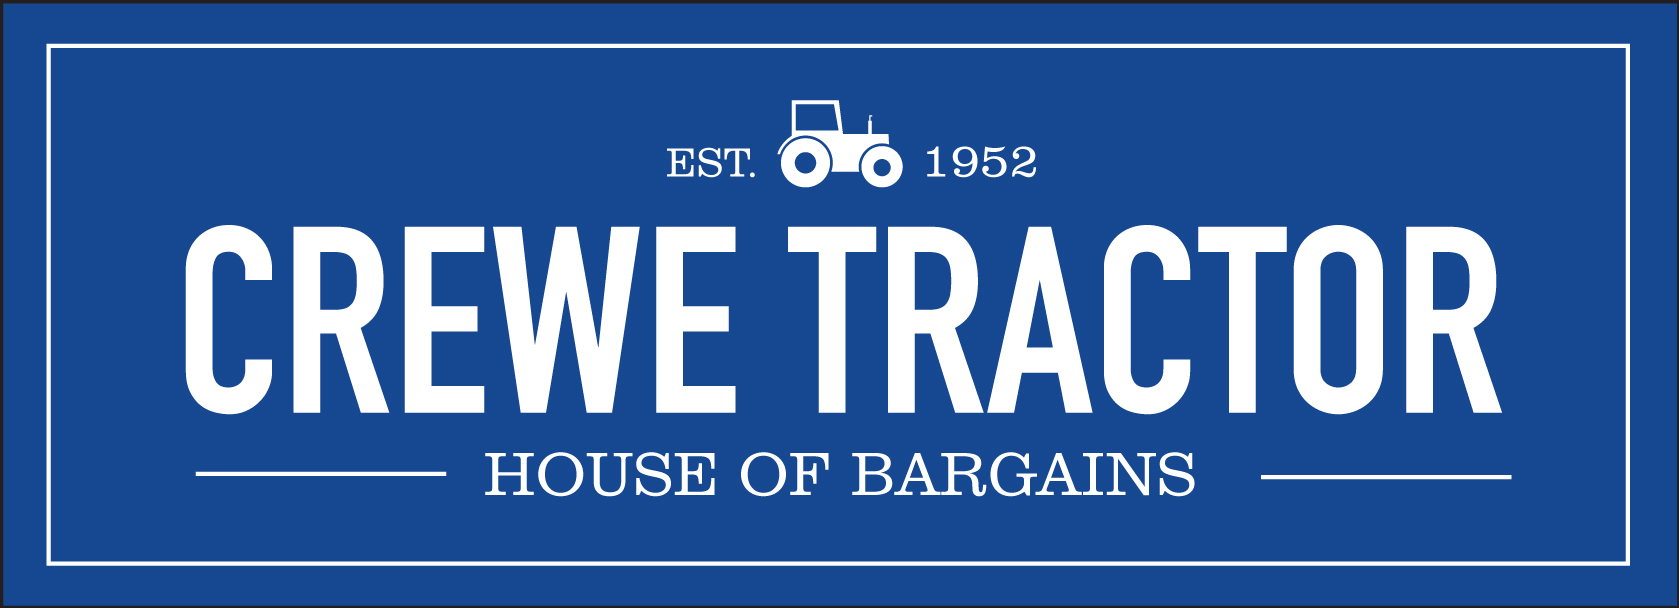 Visit Crewe Tractor homepage